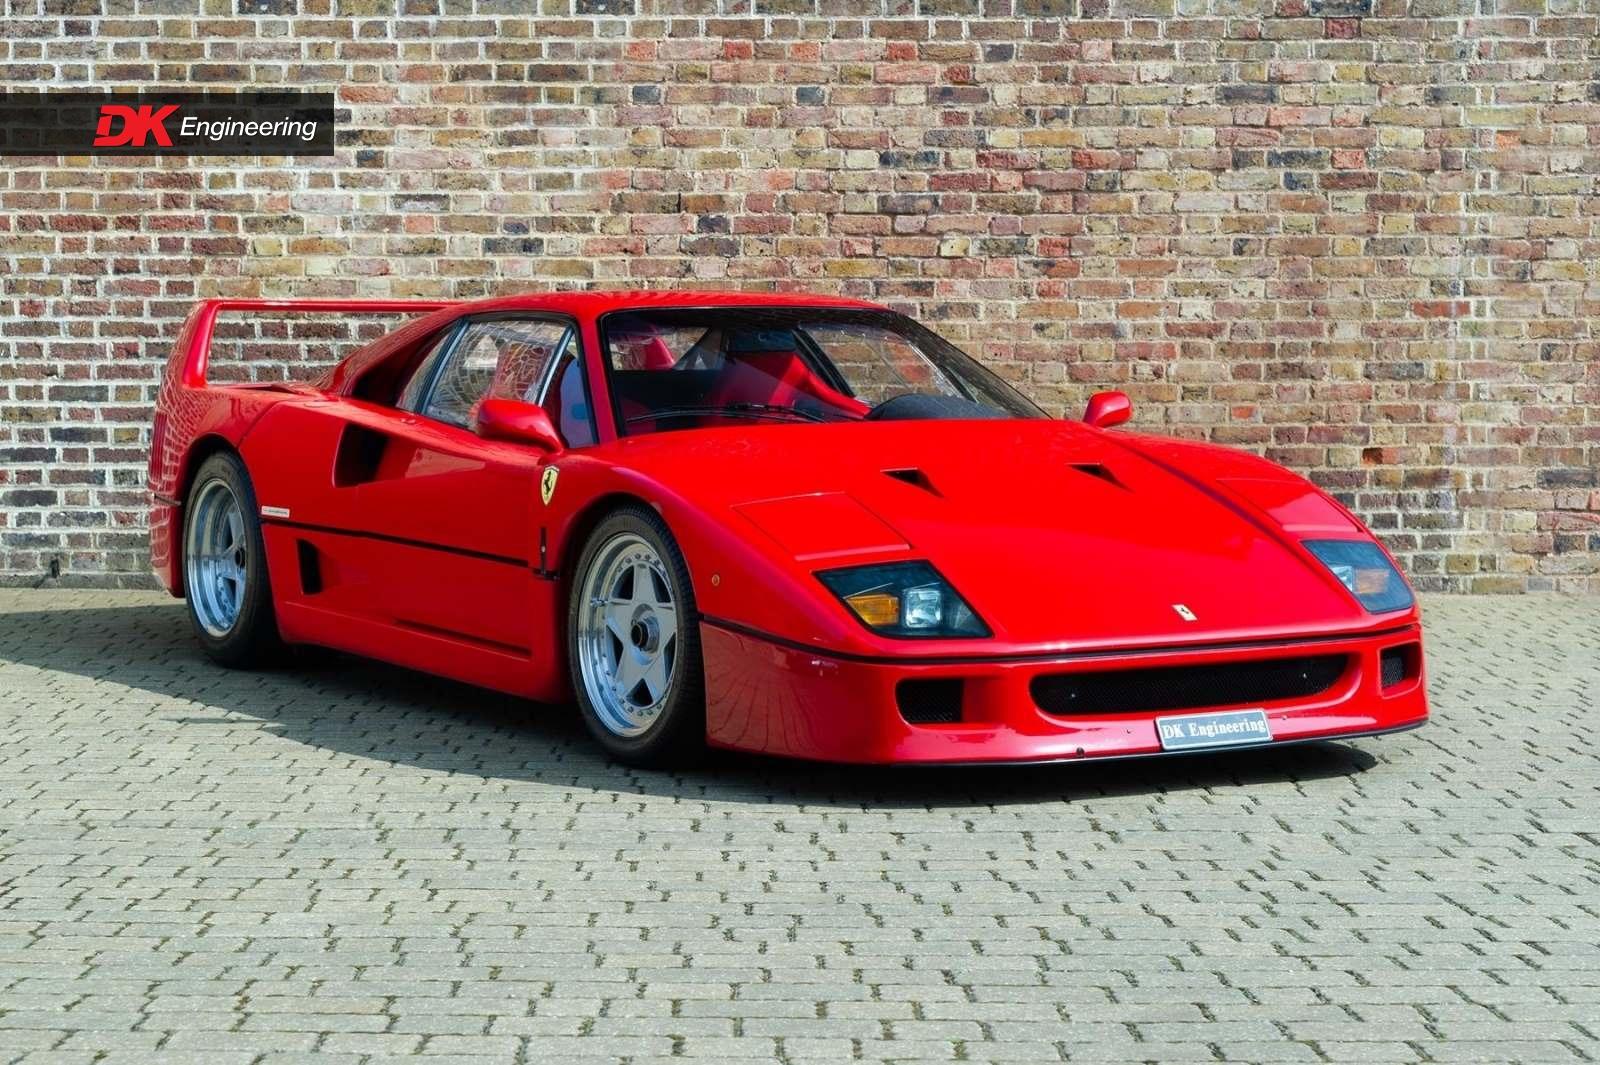 Ferrari 288 Gto For Sale >> Ferrari F40 for sale - Vehicle Sales - DK Engineering